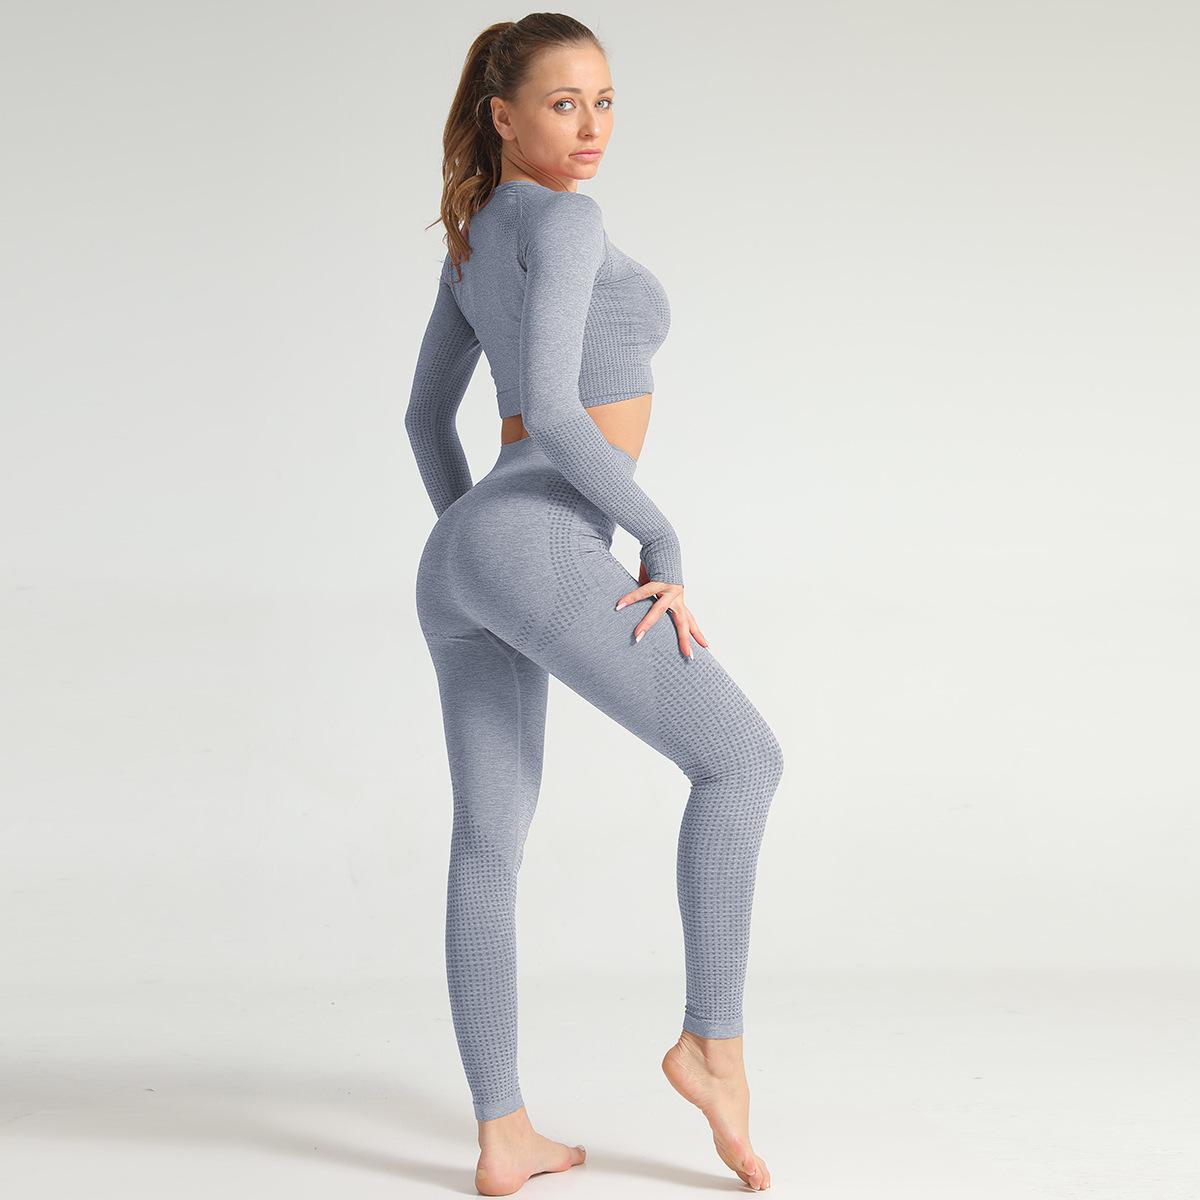 2020 Spring Summer Women Gymwear Seamless Bra Peach Butt Leggings Knitting  Yoga Set 8